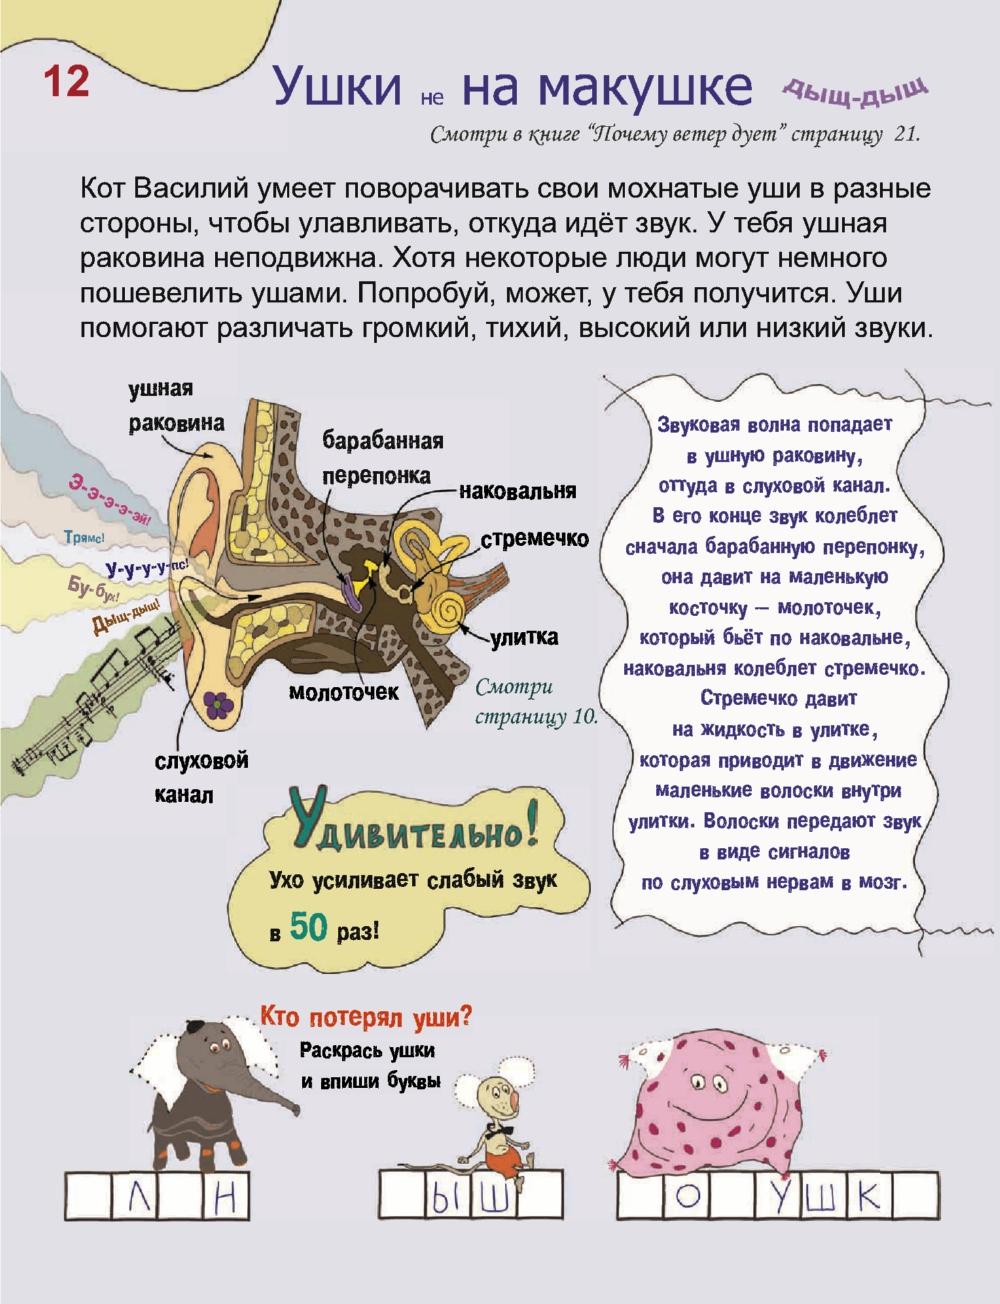 http://i6.imageban.ru/out/2013/12/09/5c854f5cceb485b615d3a02f08b819ce.jpg